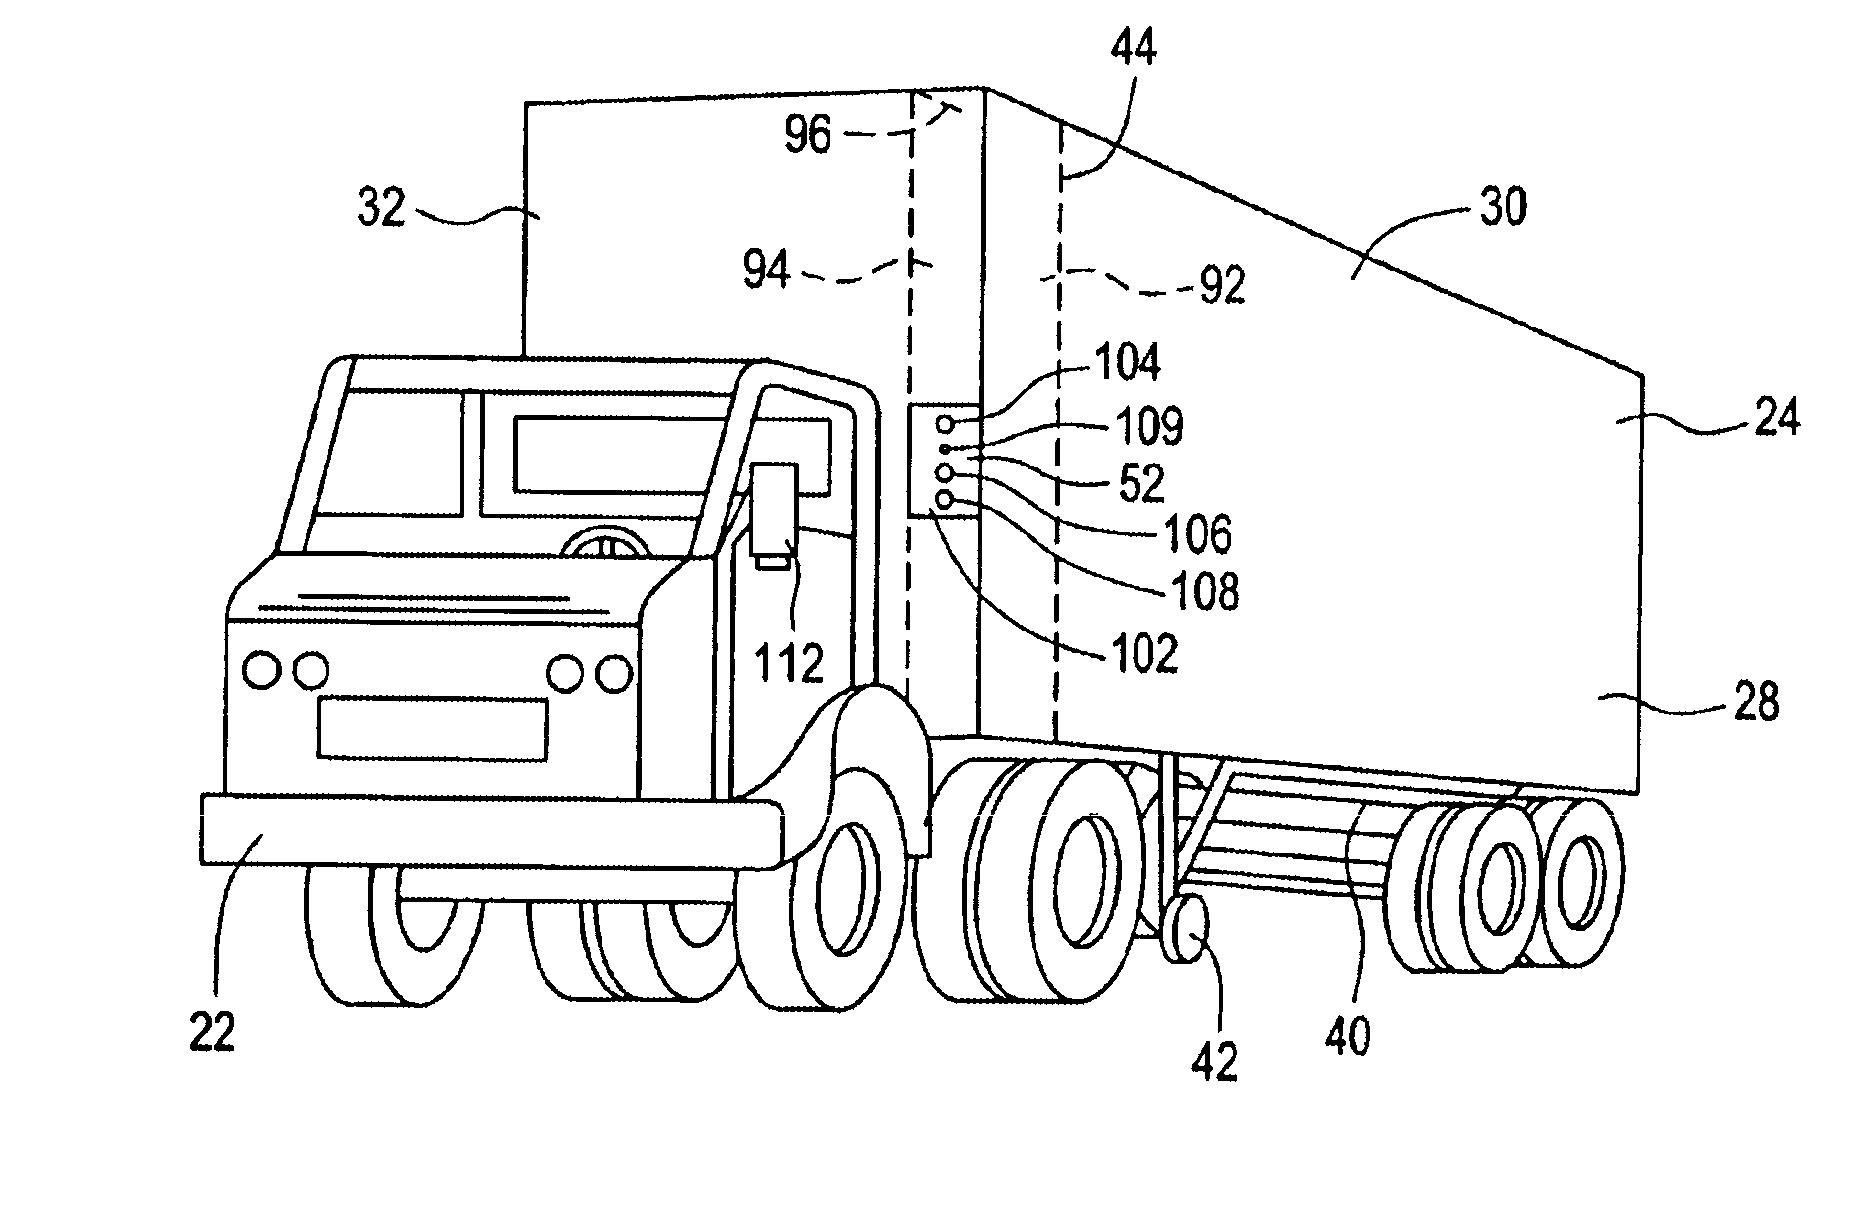 semi truck diagram 1998 honda civic engine lighting free image for